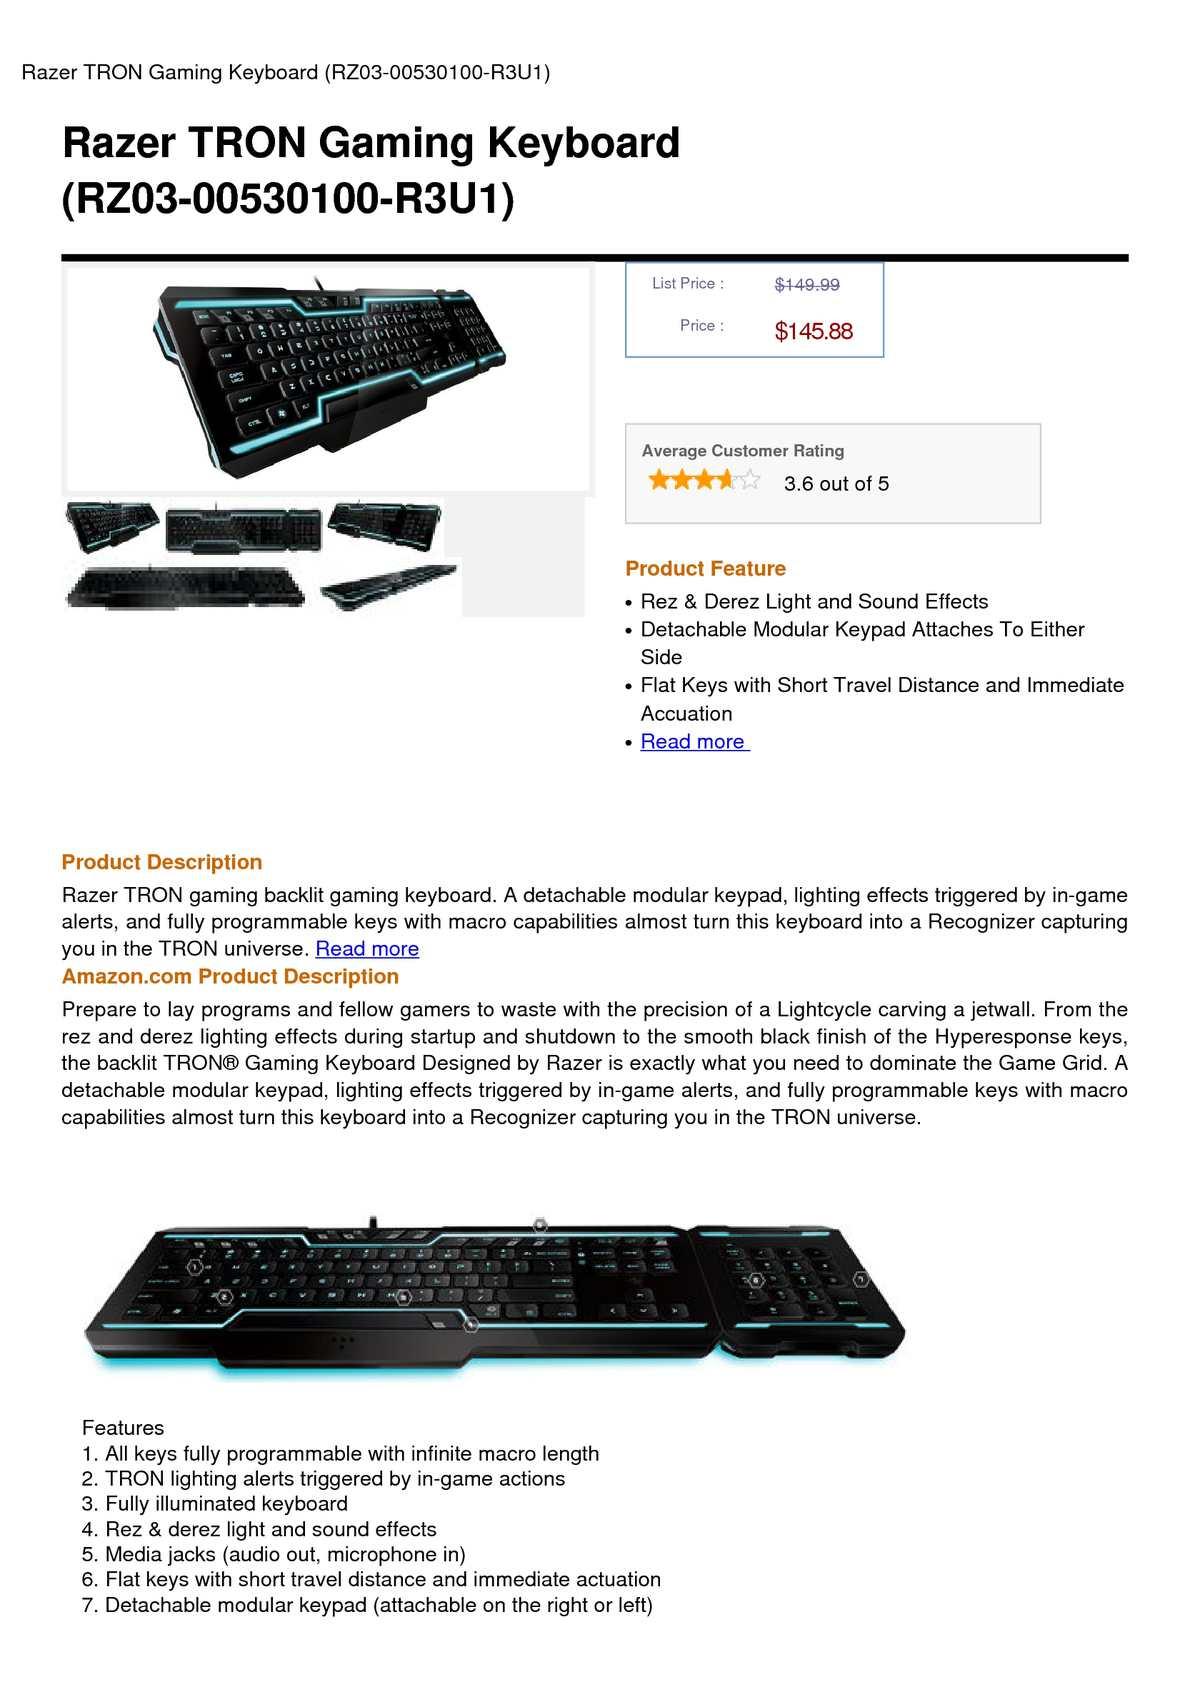 Calaméo - Razer TRON Gaming Keyboard